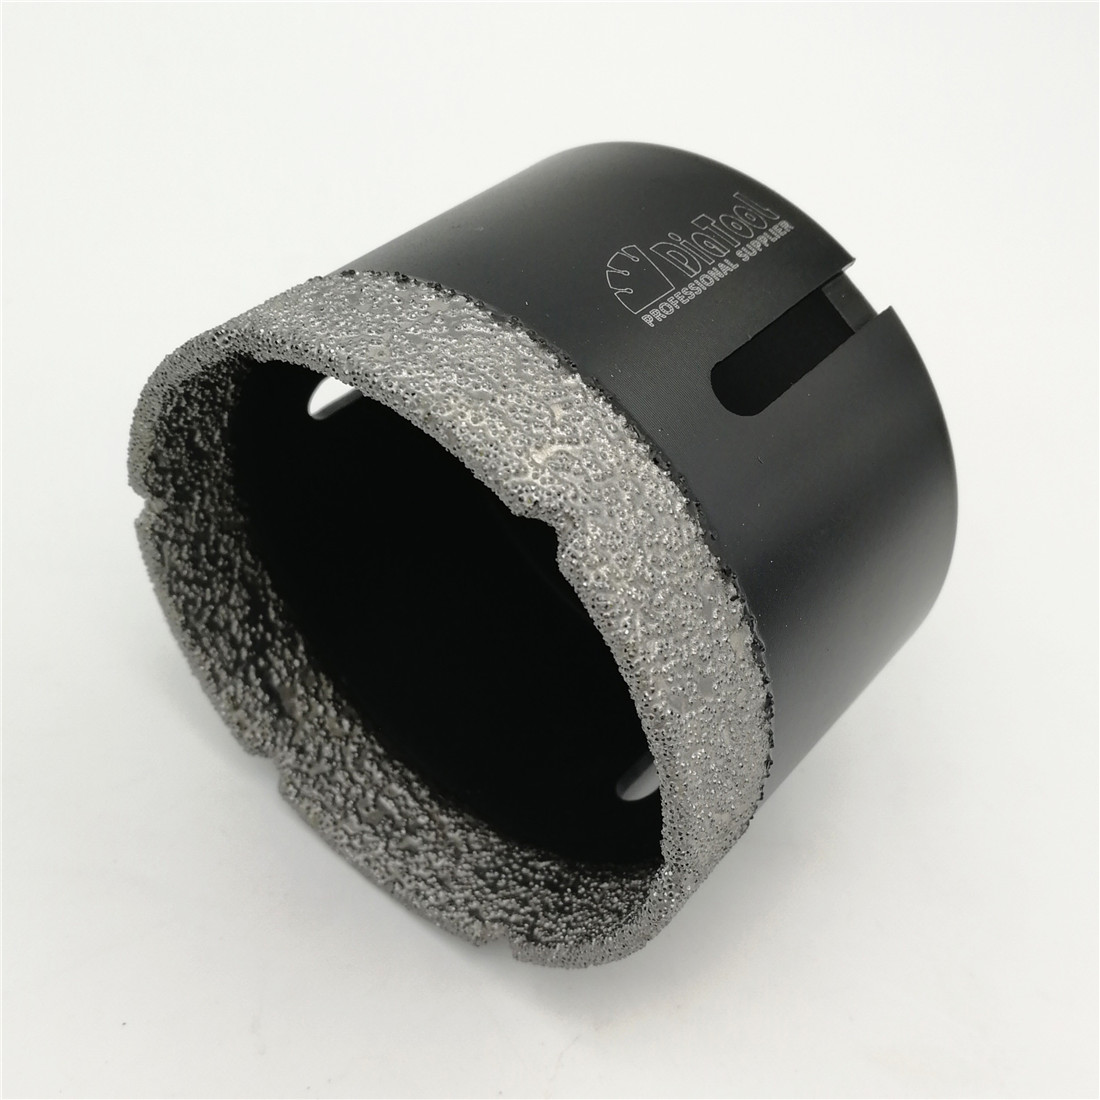 цена на DIATOOL 3 Vacuum brazed diamond Dry drilling bits with 5/8-11 connection Diameter 76mm for porcelain marble stone Masonry brick